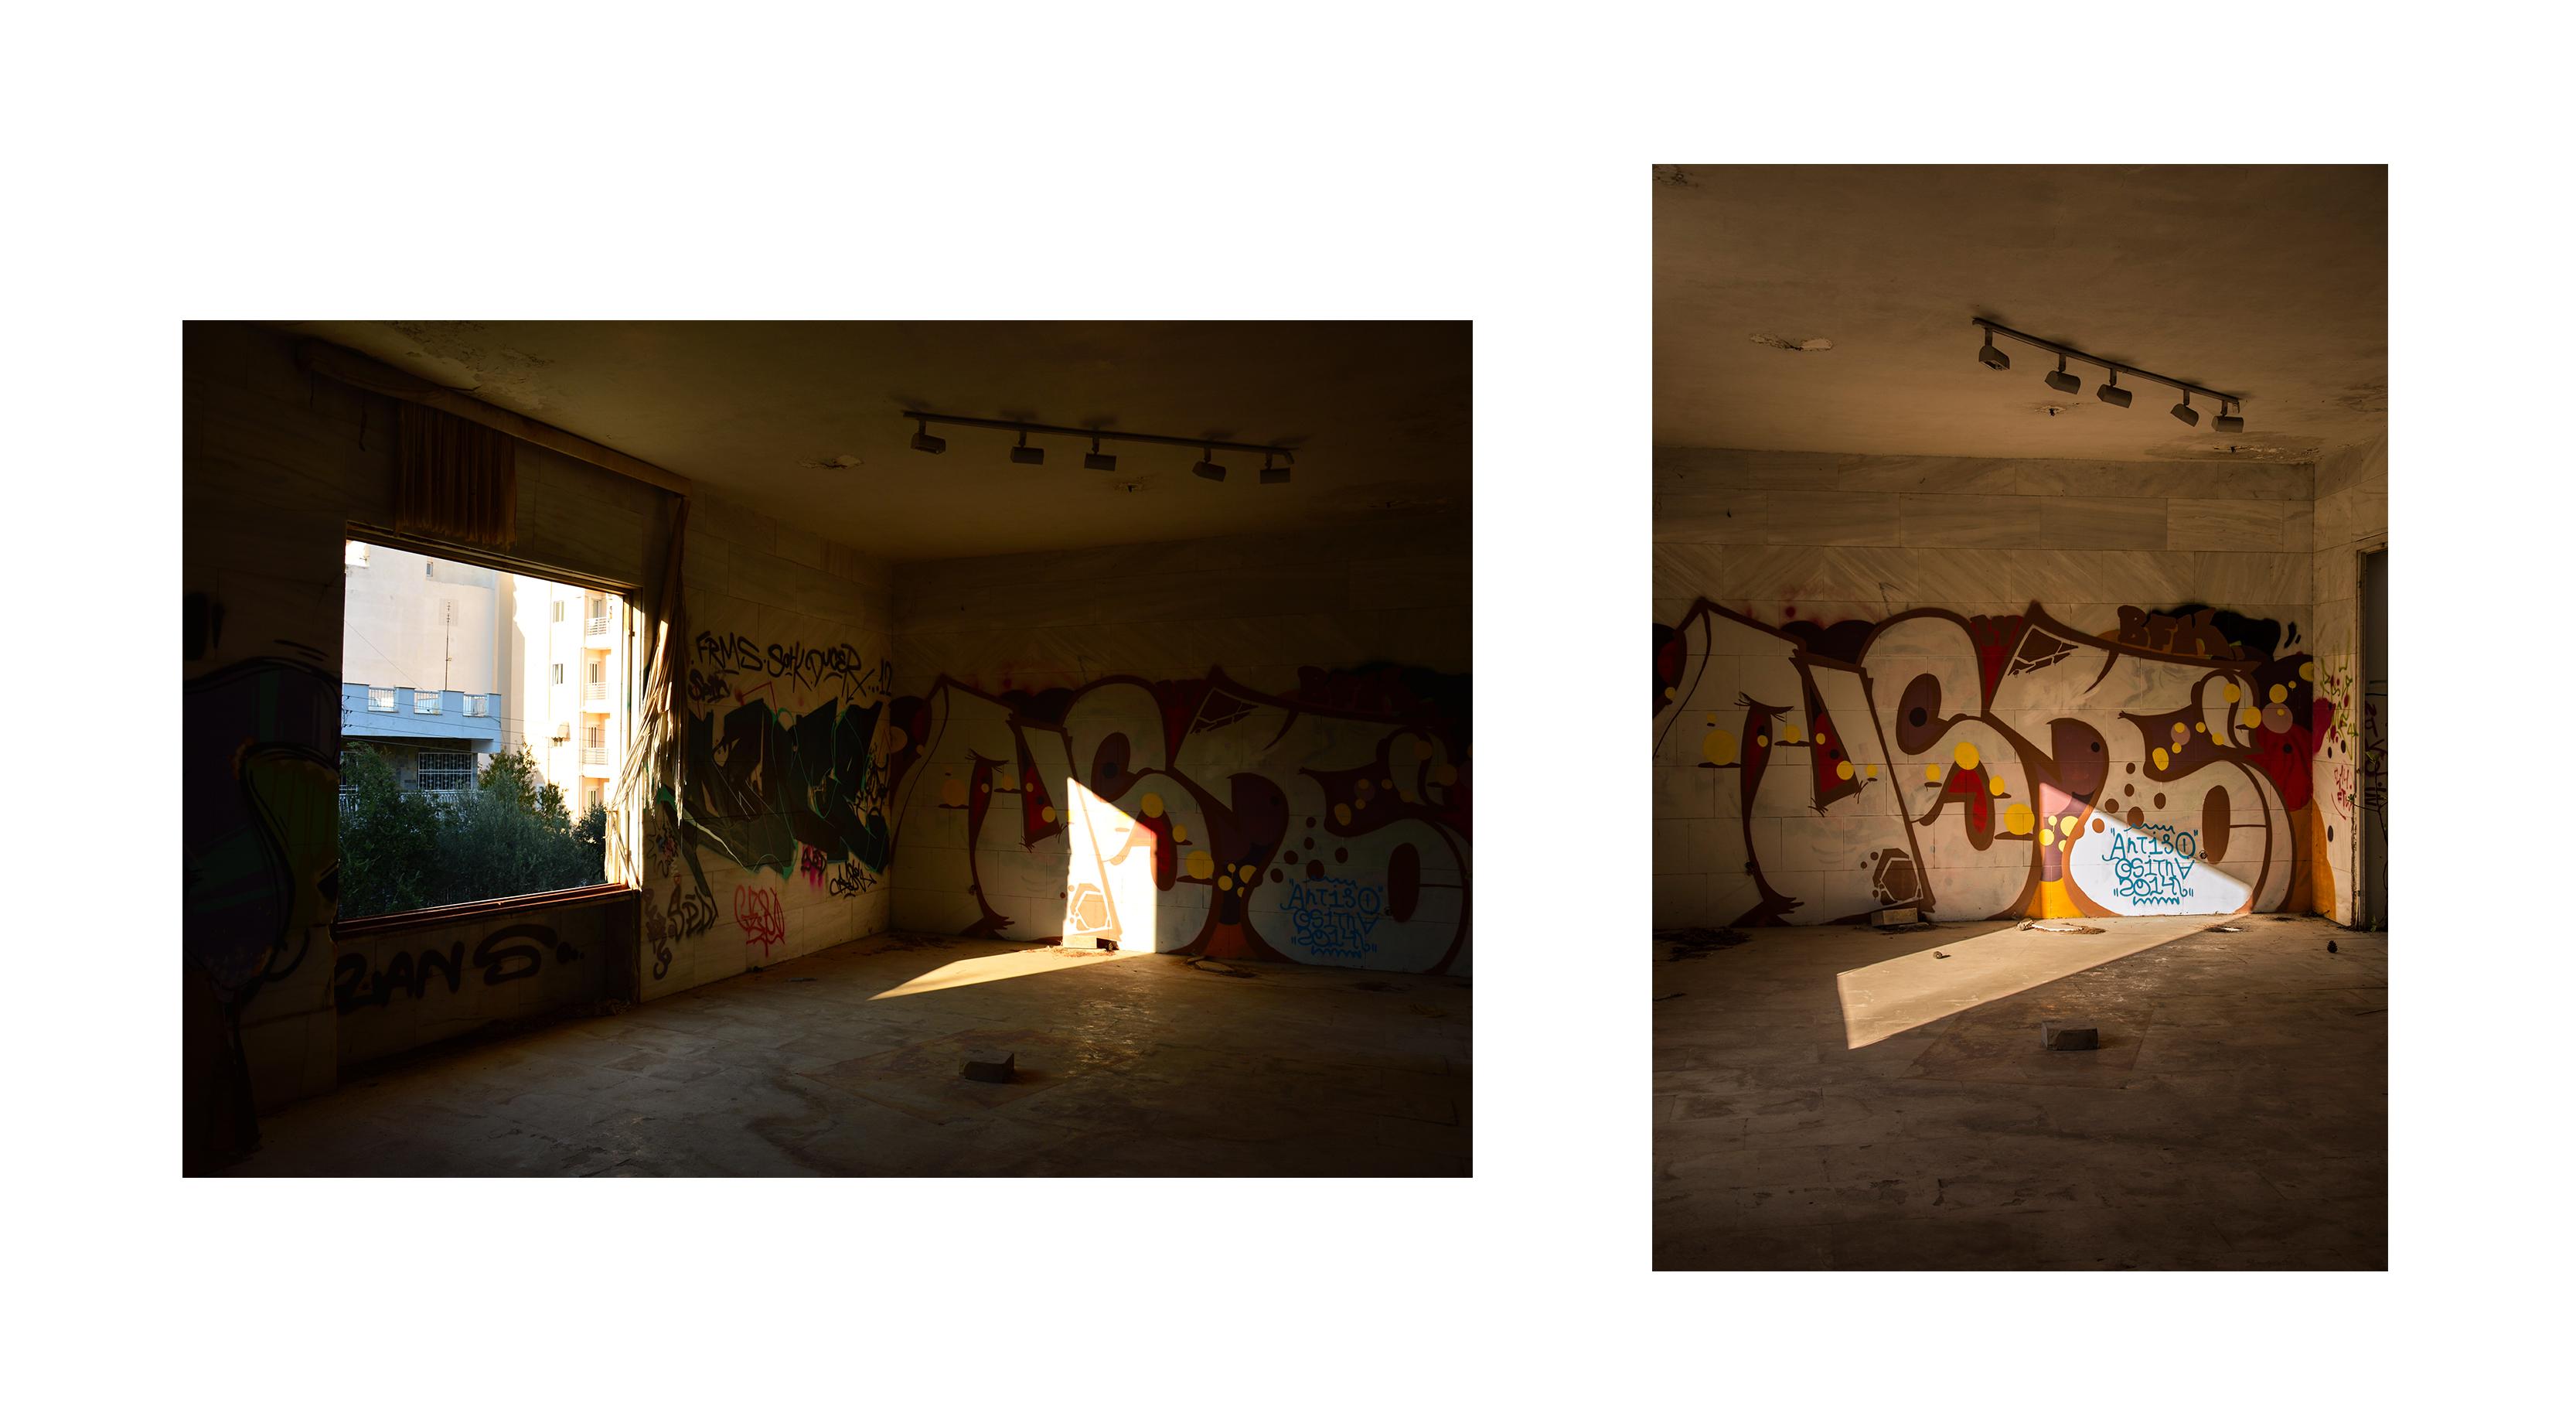 Hintergrundbilder : Nikon, Nikkor, Kamera, Linse, Dslr, Erfassung ...